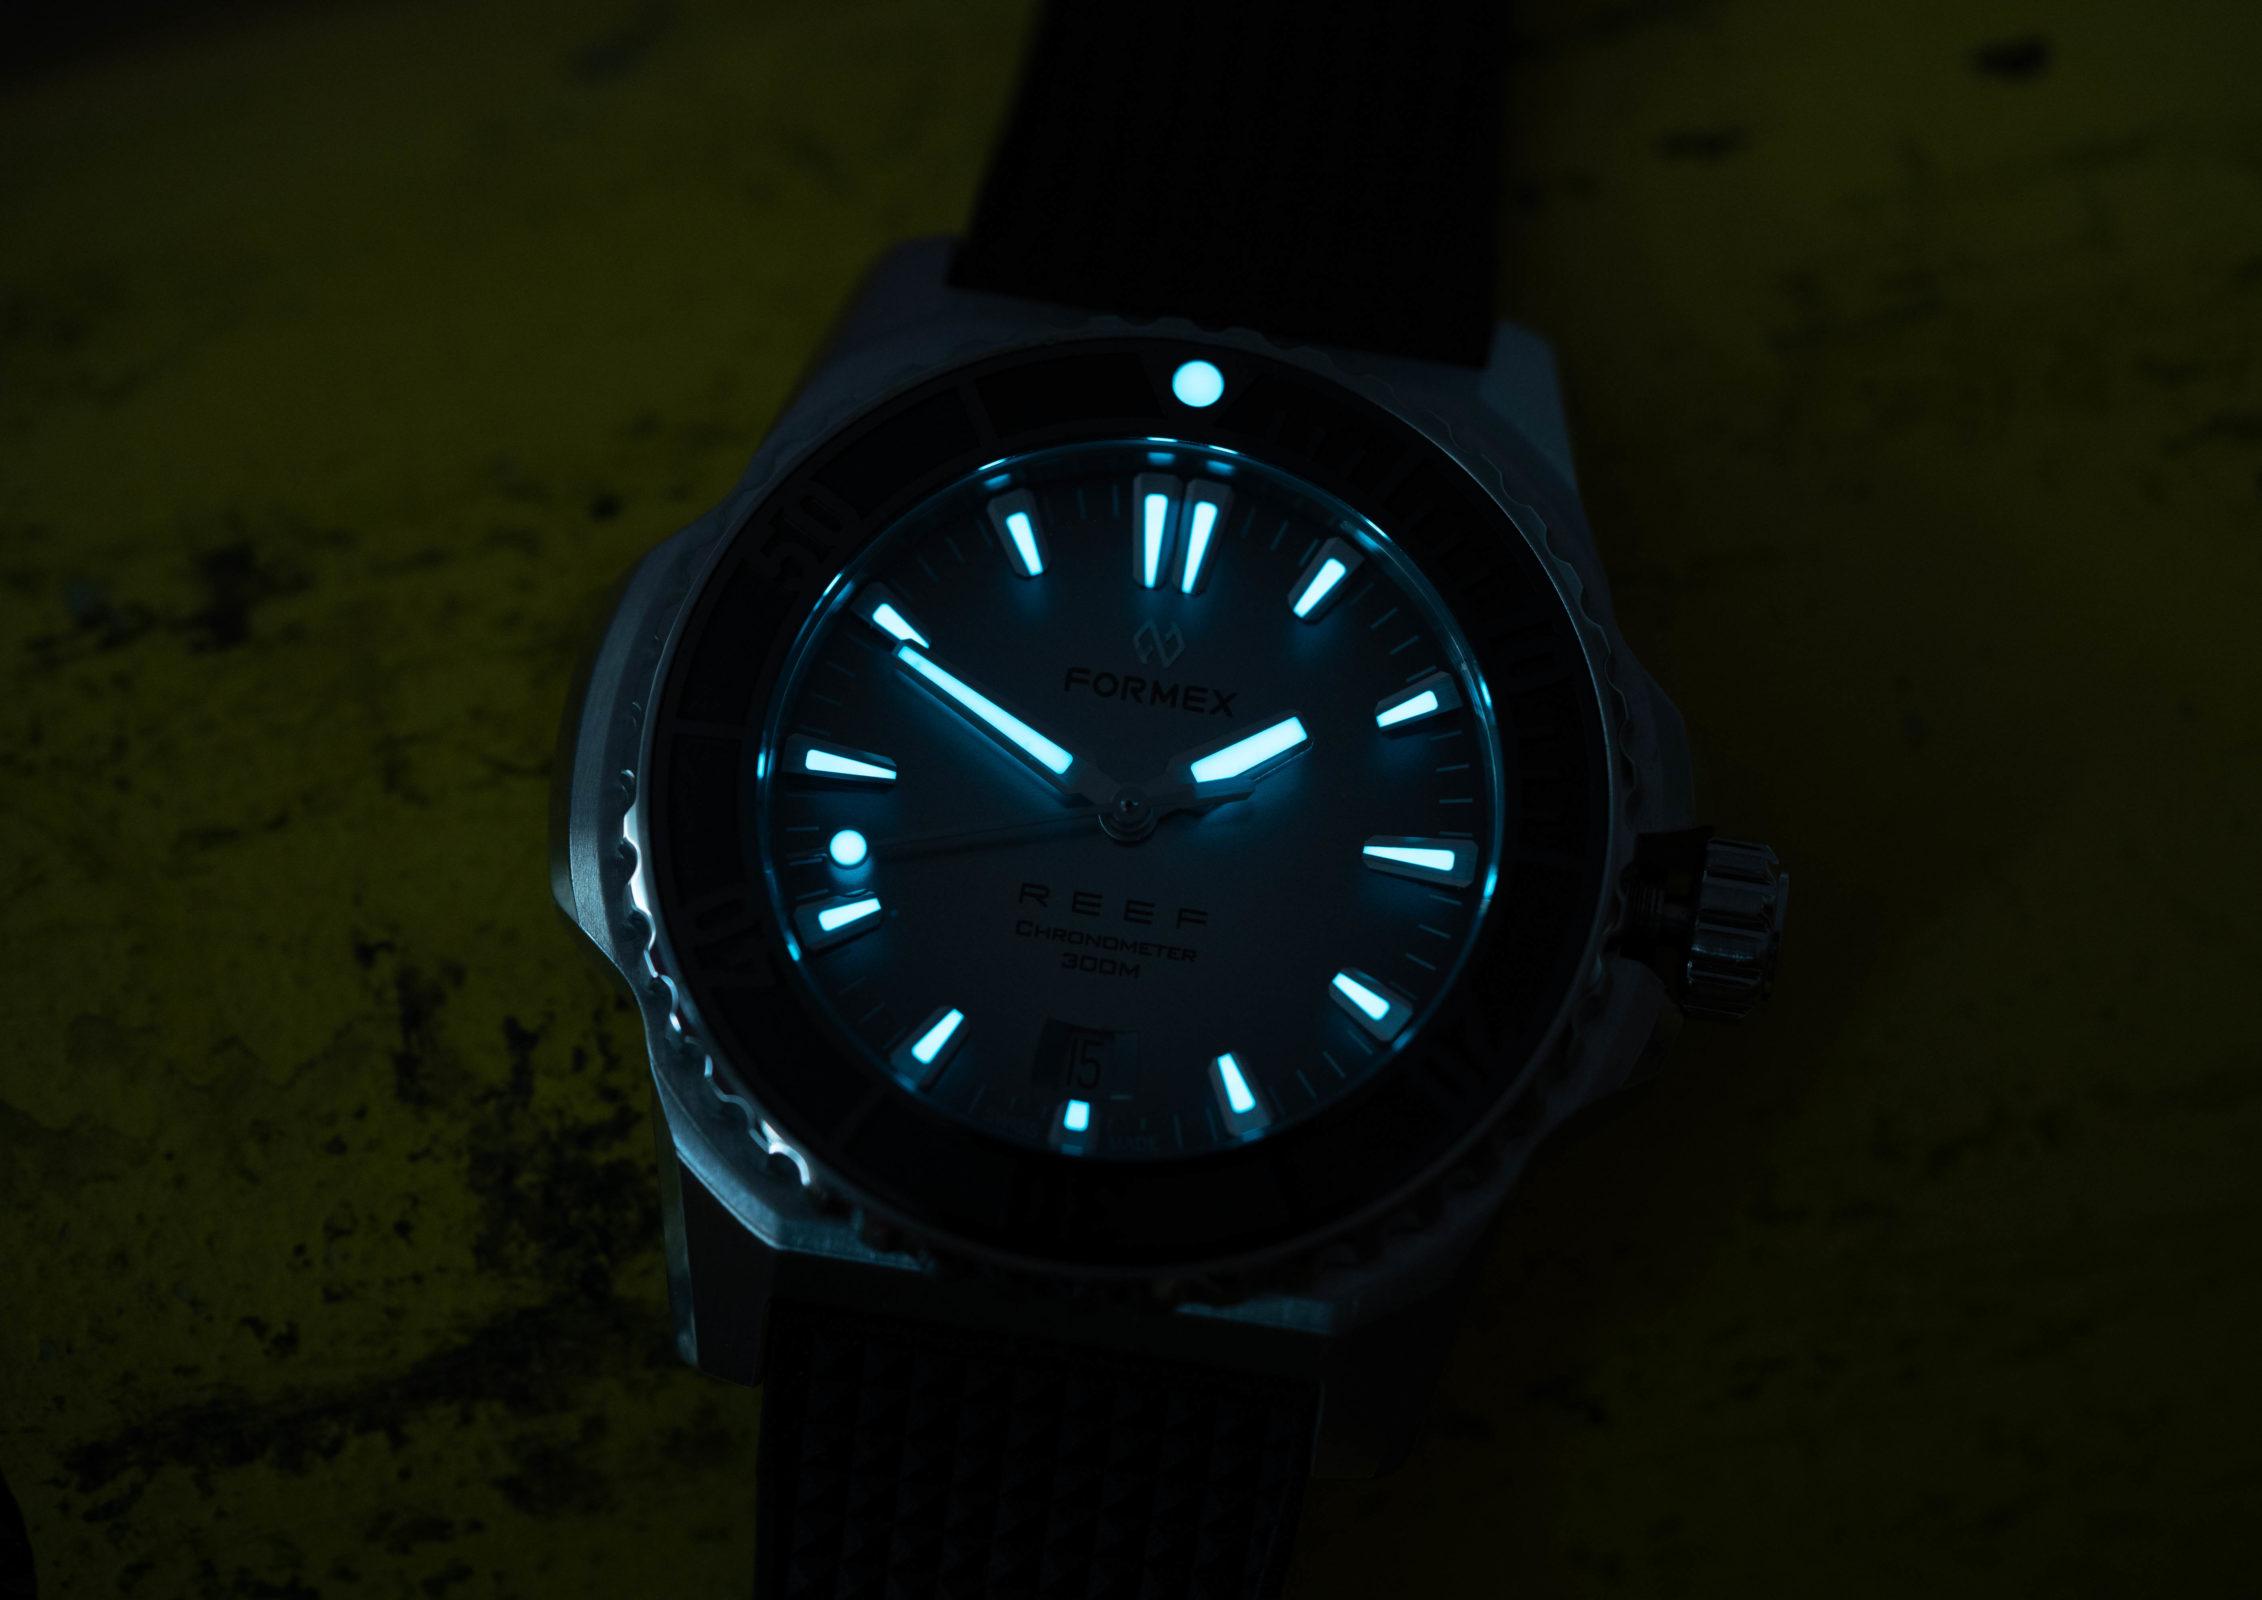 Formex Reef Automatik Chronometer 300m-31